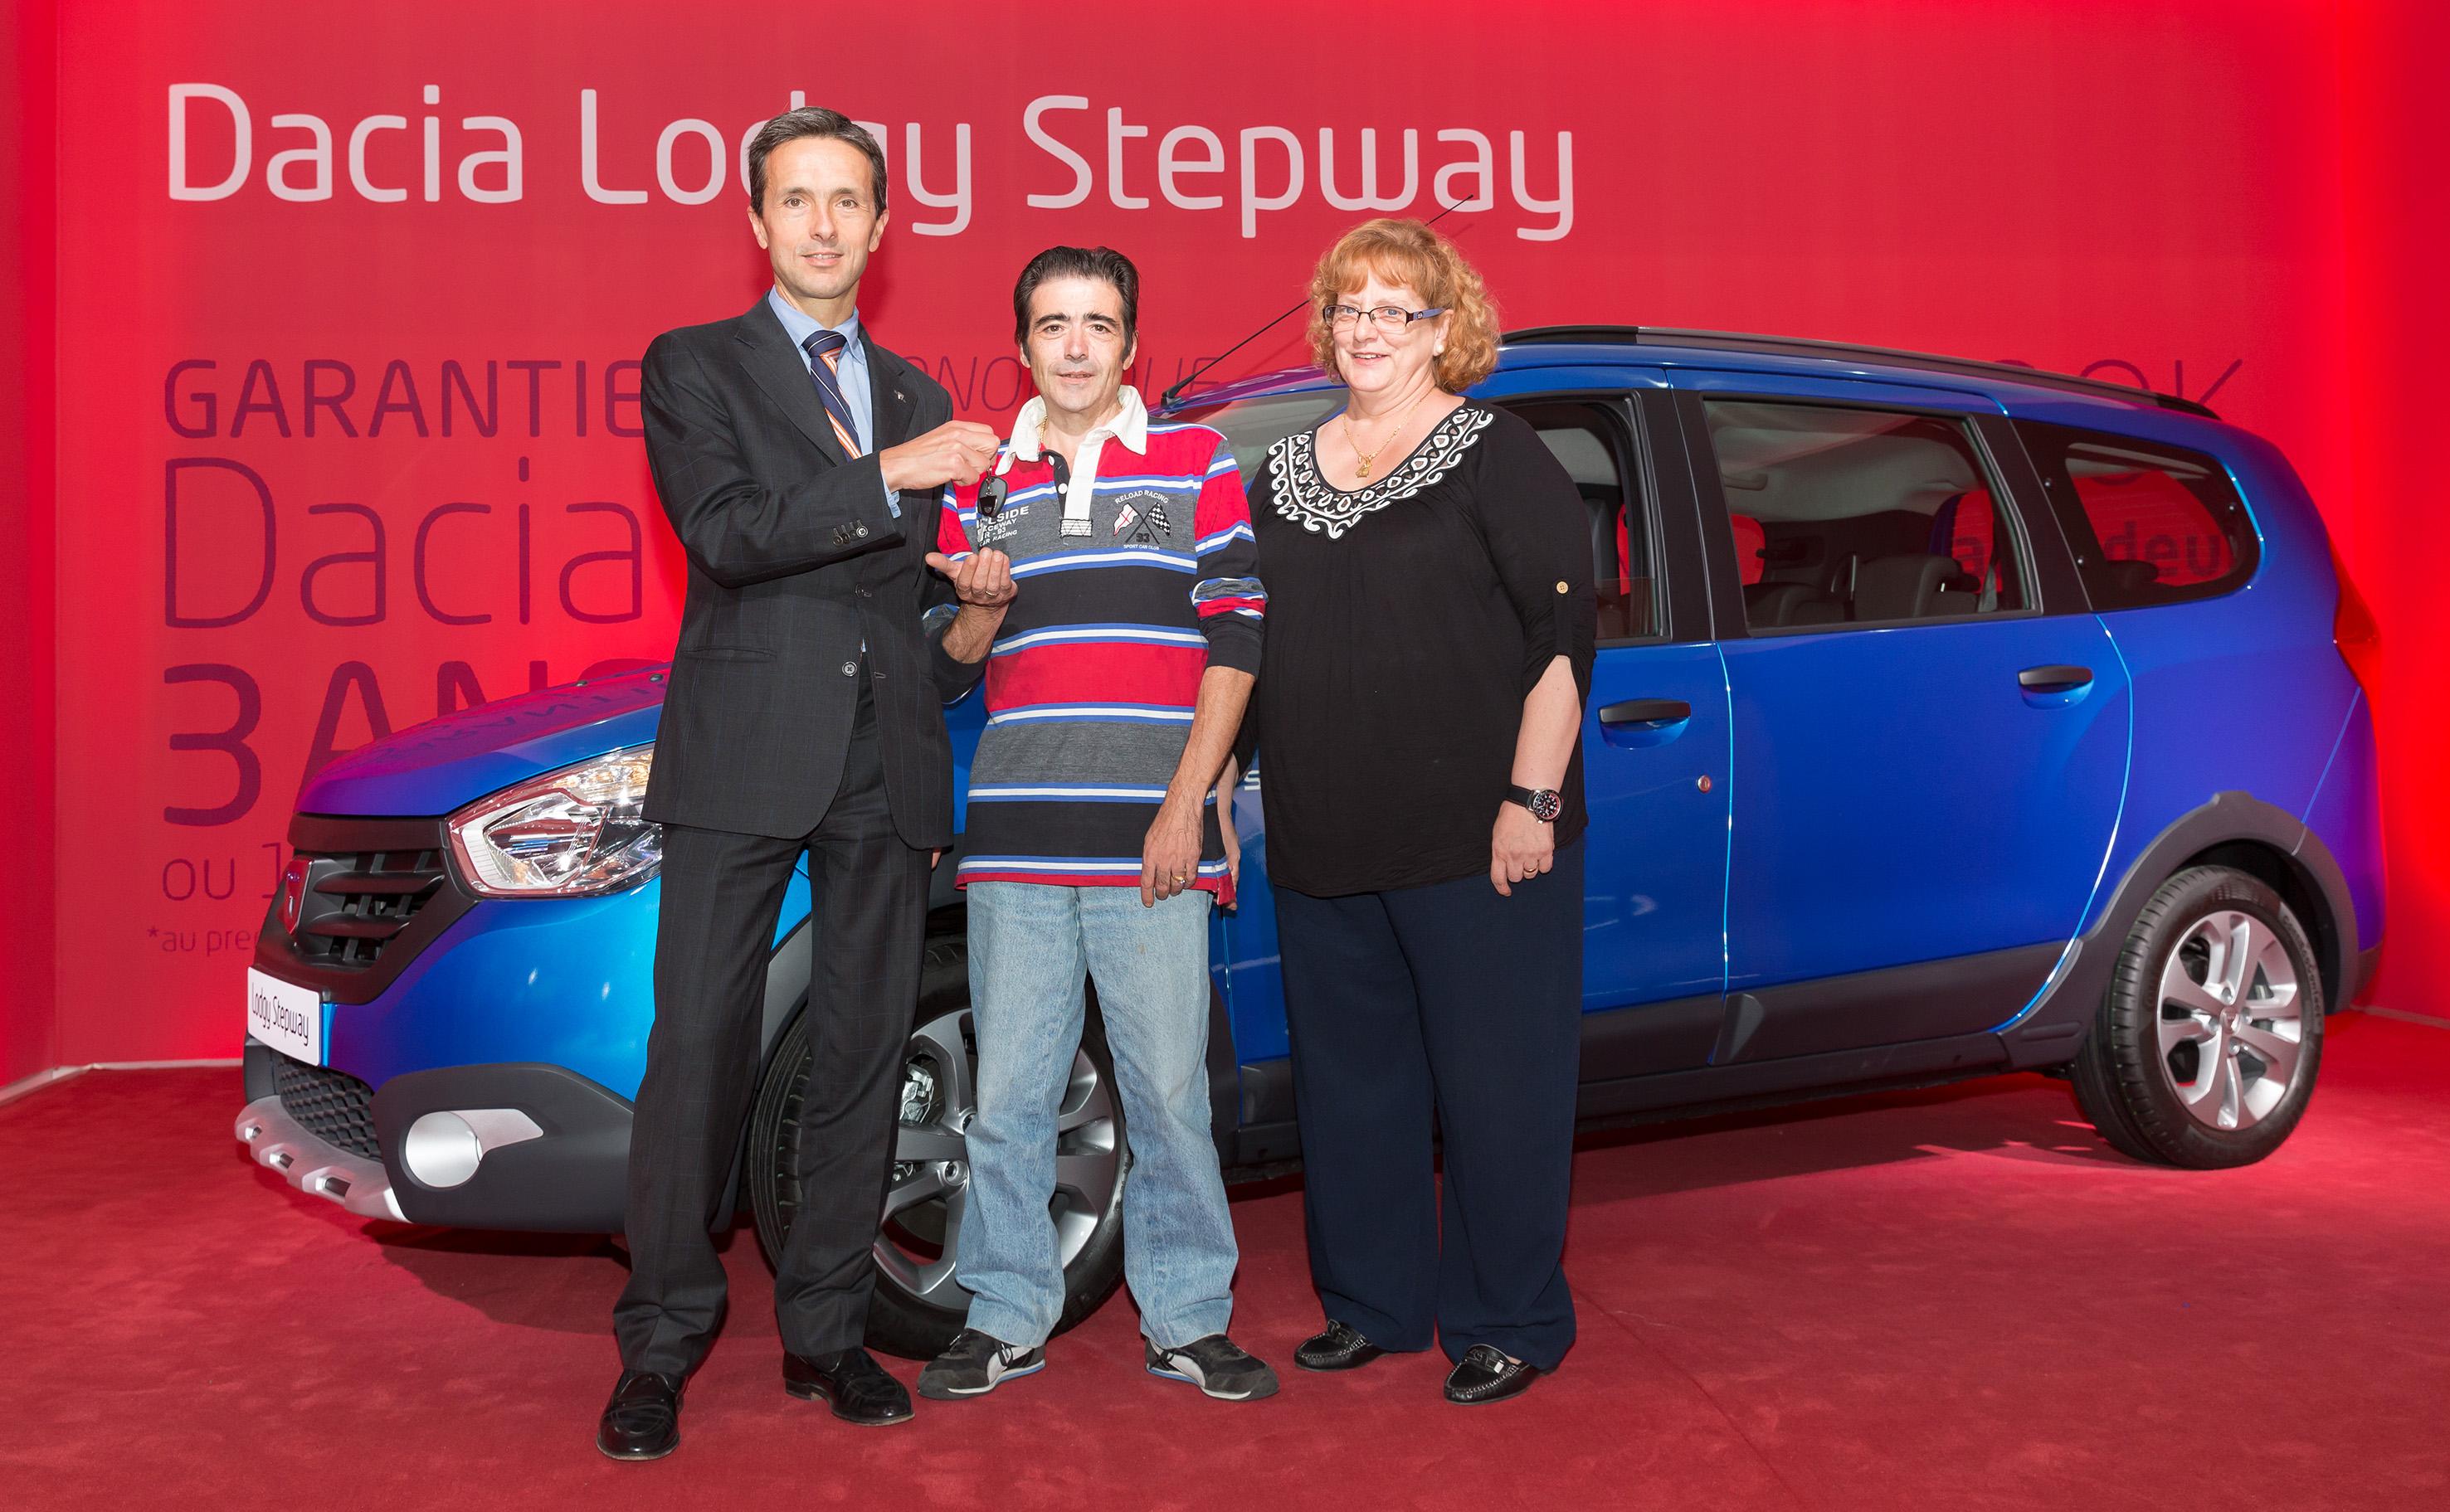 Dacia: oltre 3 milioni di vendite dal 2004